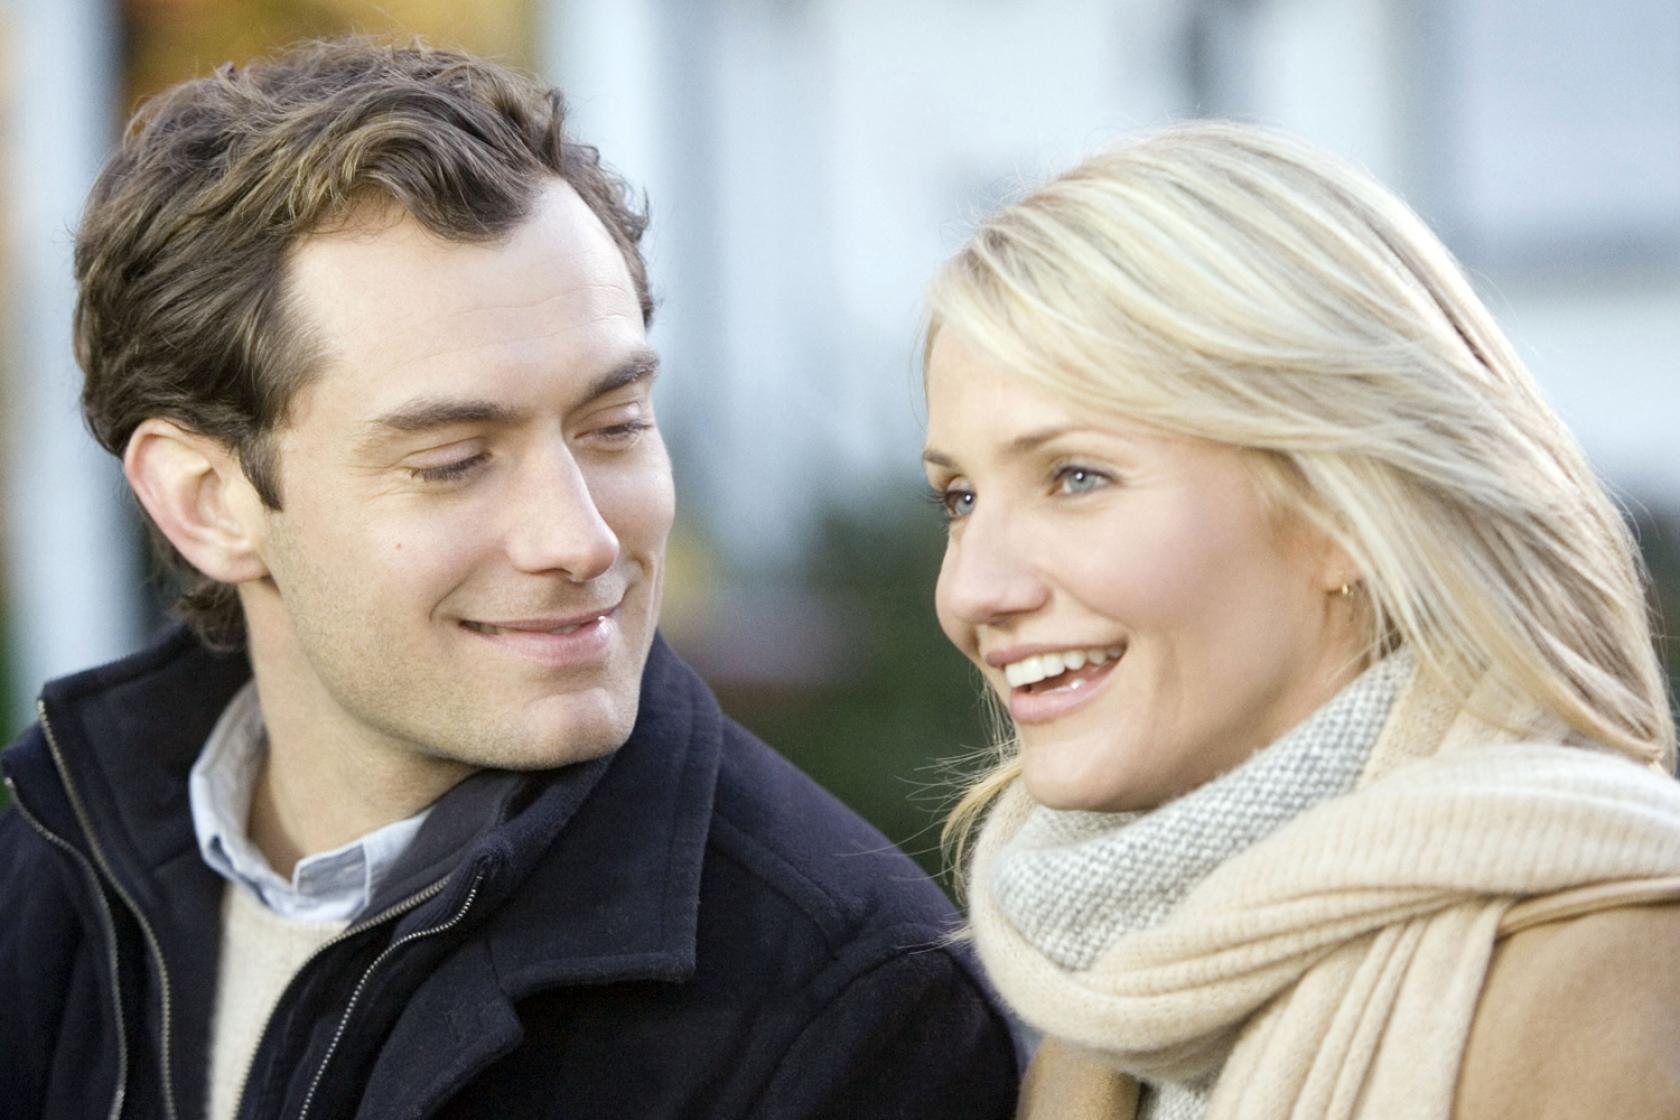 Top Βαθμολογήθηκε ιστοσελίδες dating UK